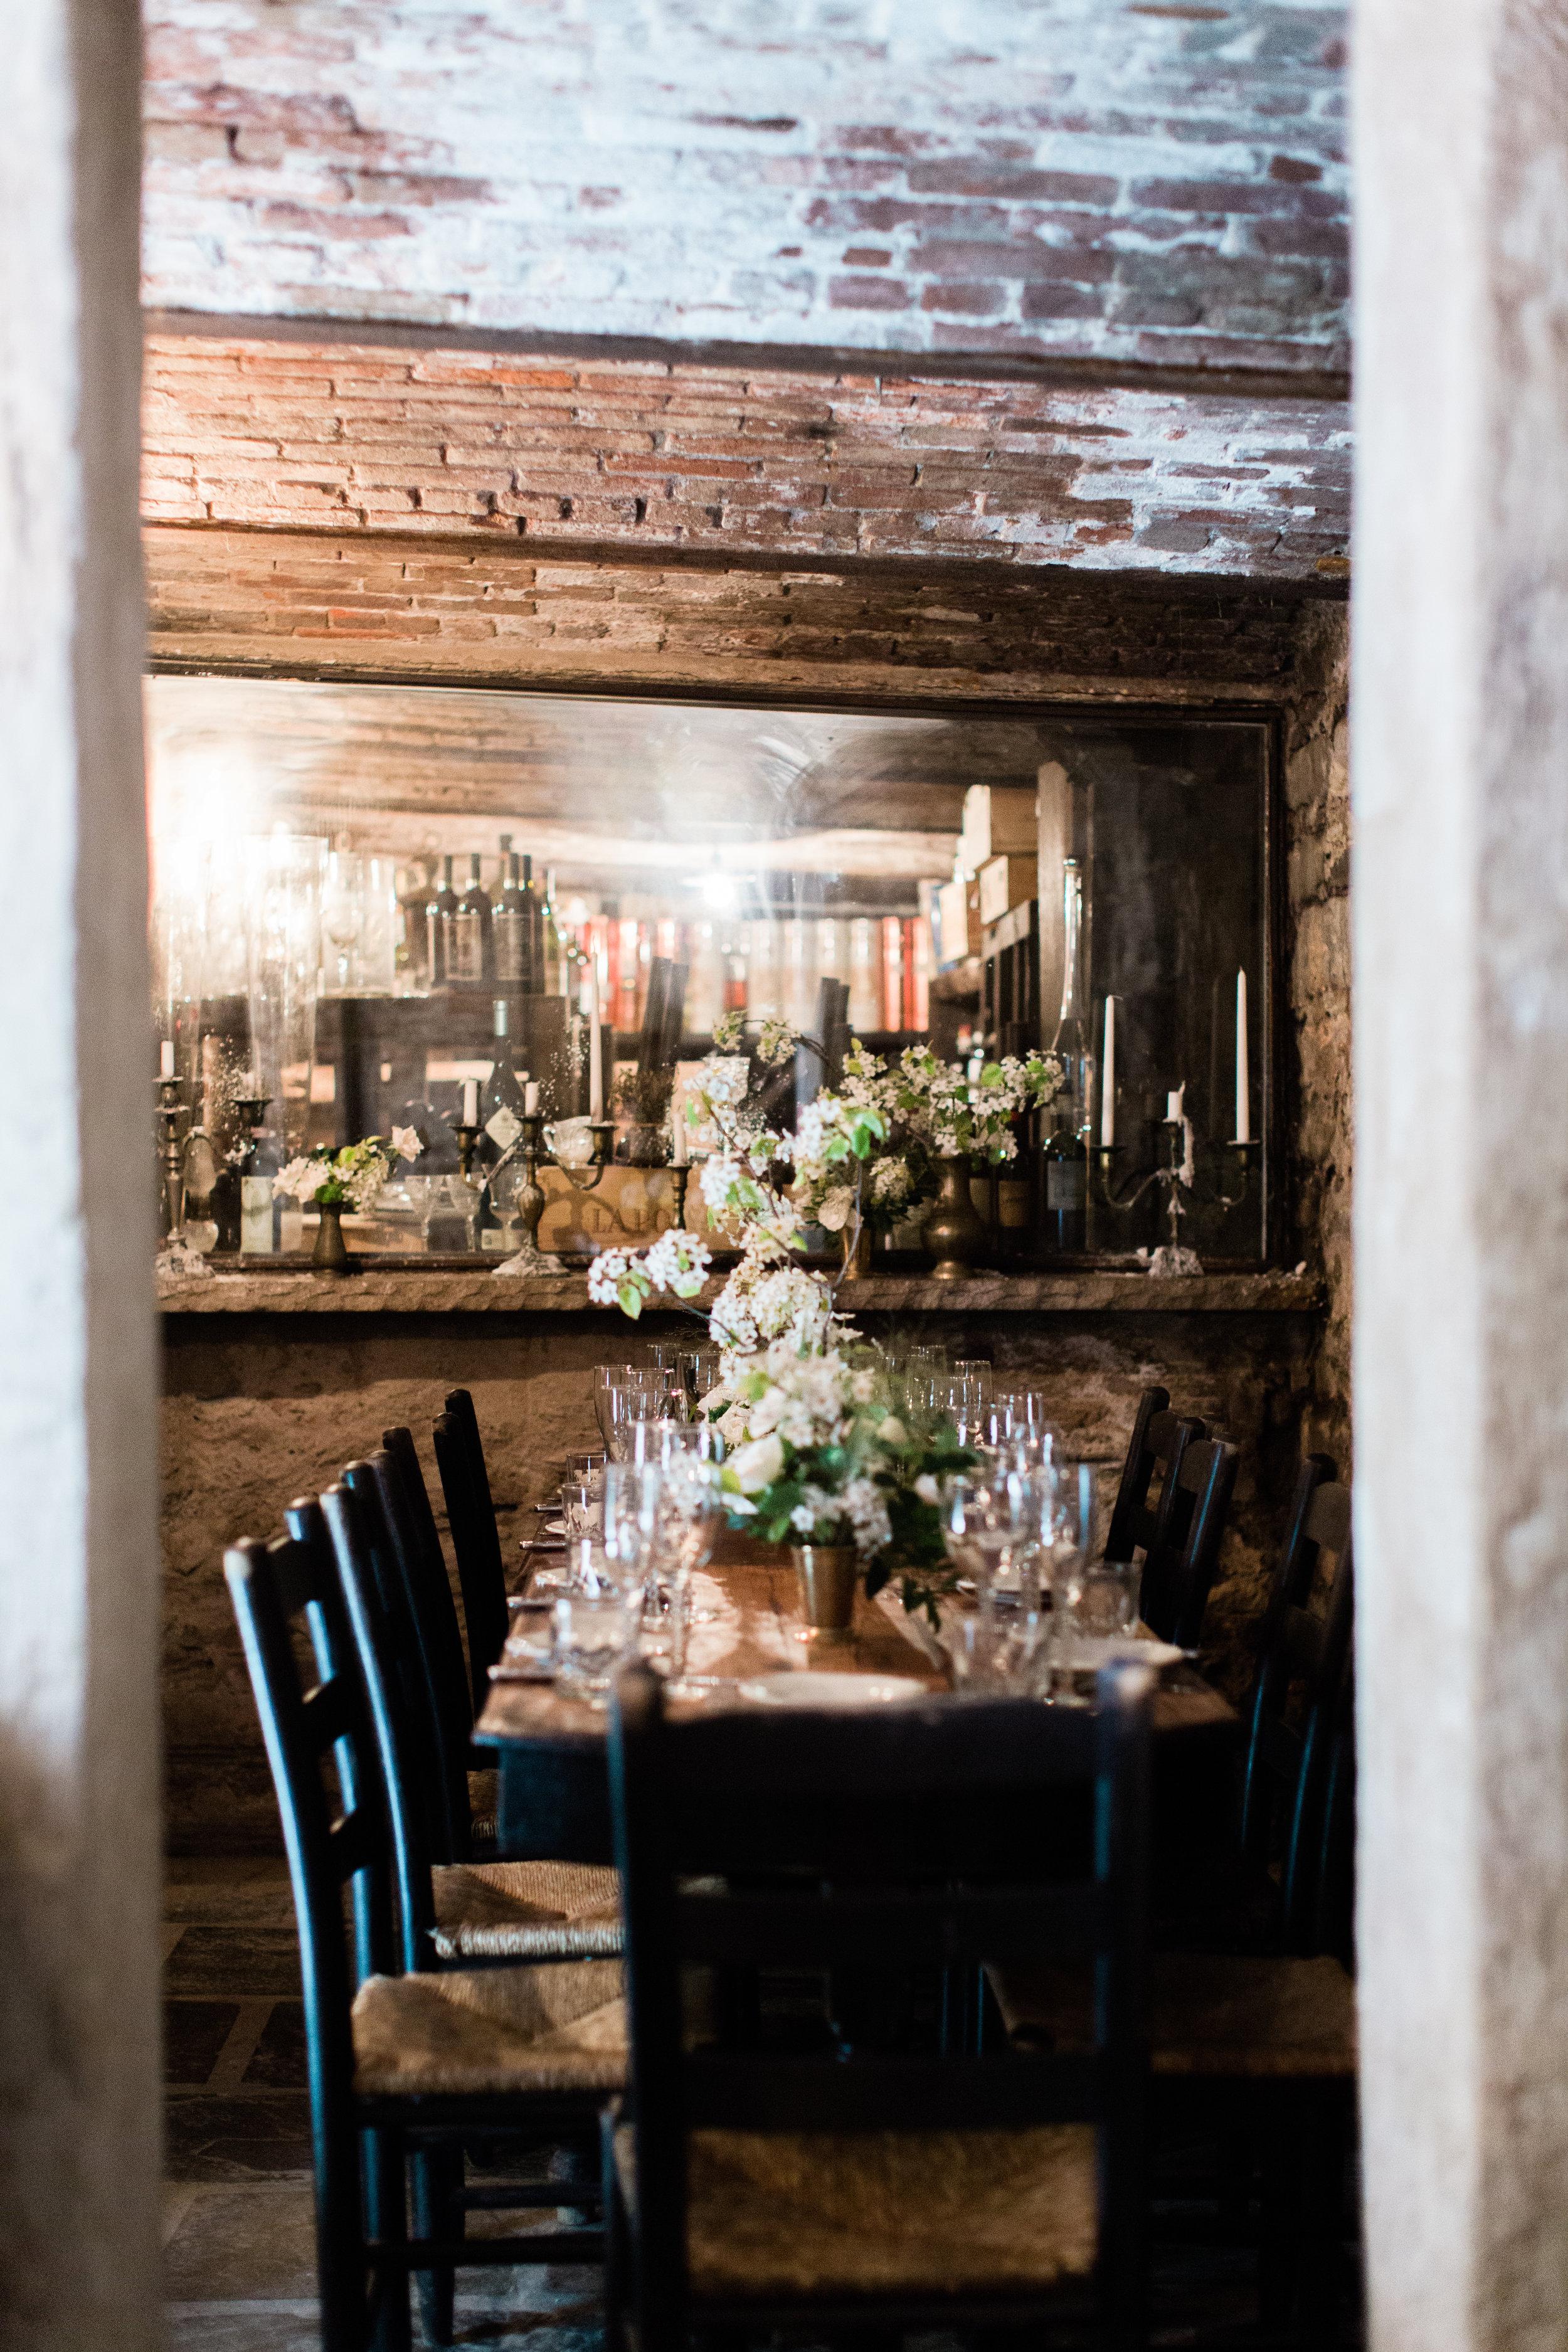 Downstairs, Small Vault Room  © Heather Waraksa, photographer